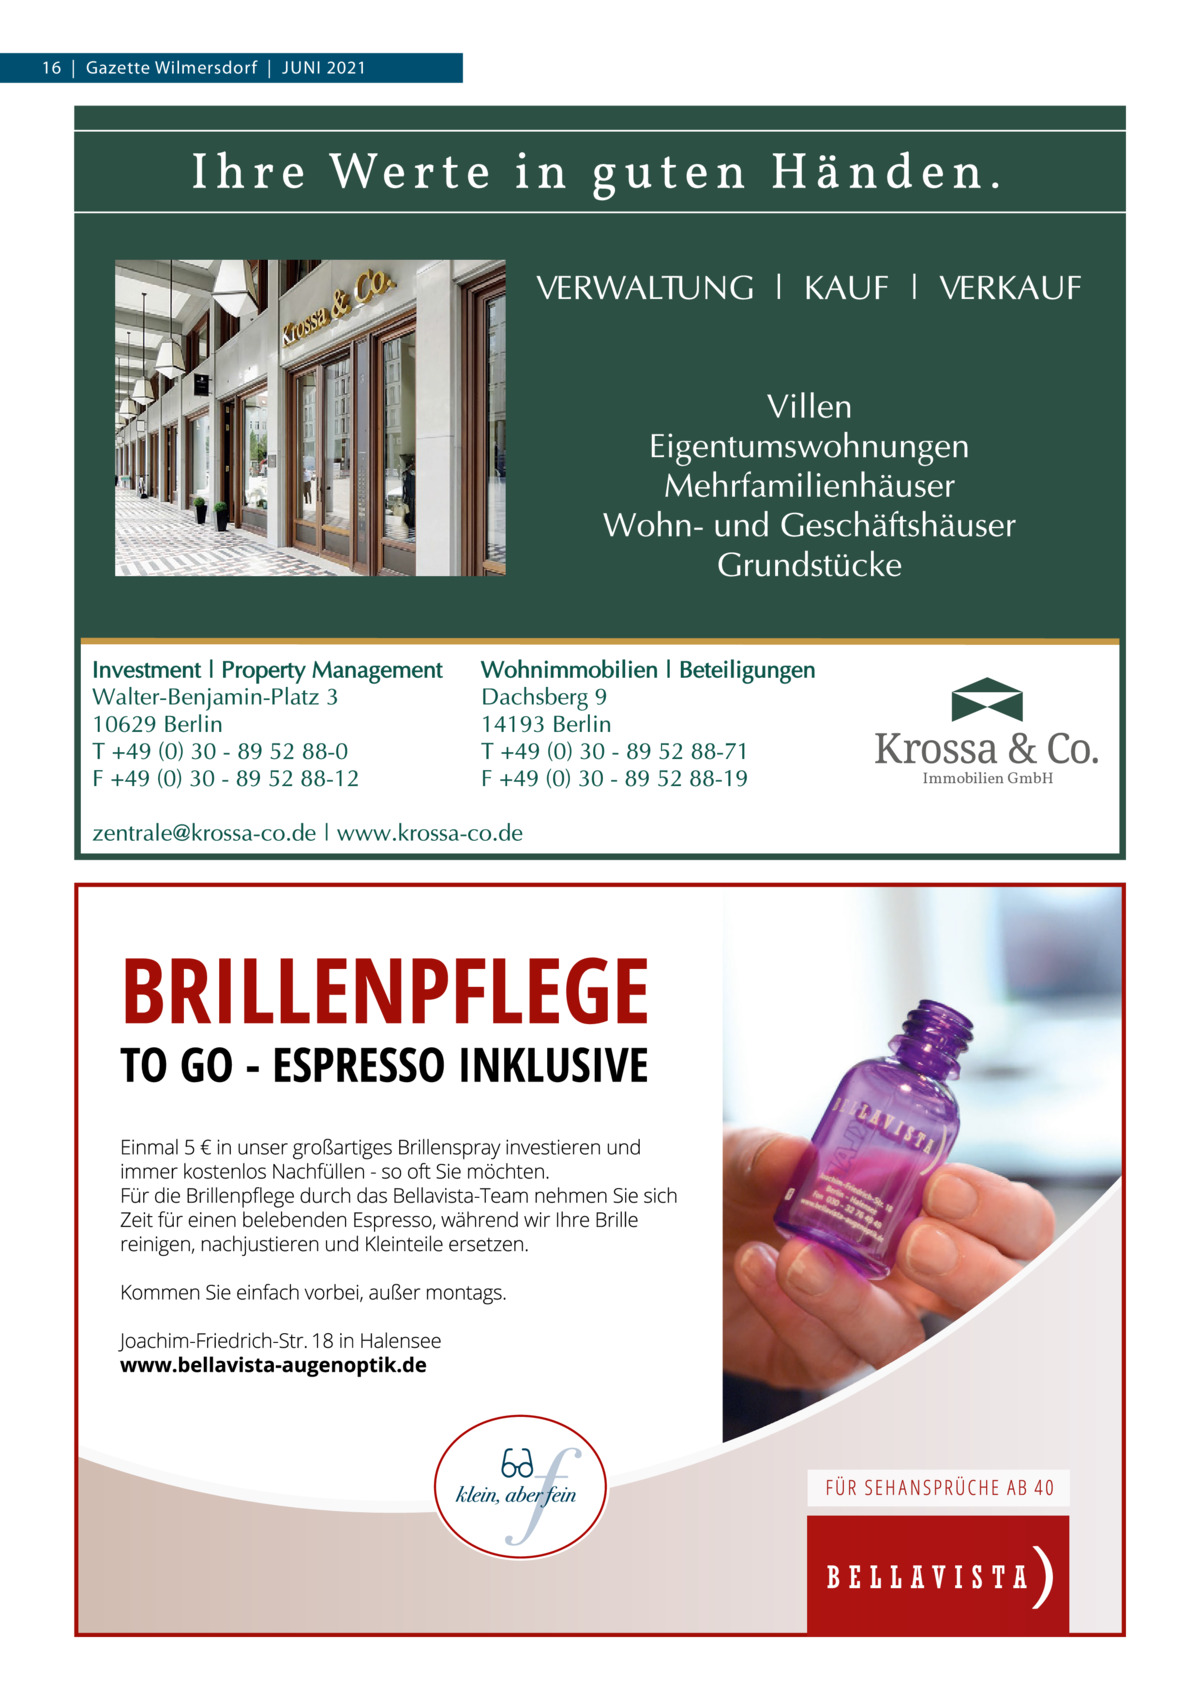 16 Gazette Wilmersdorf Juni 2021  Immobilien GmbH